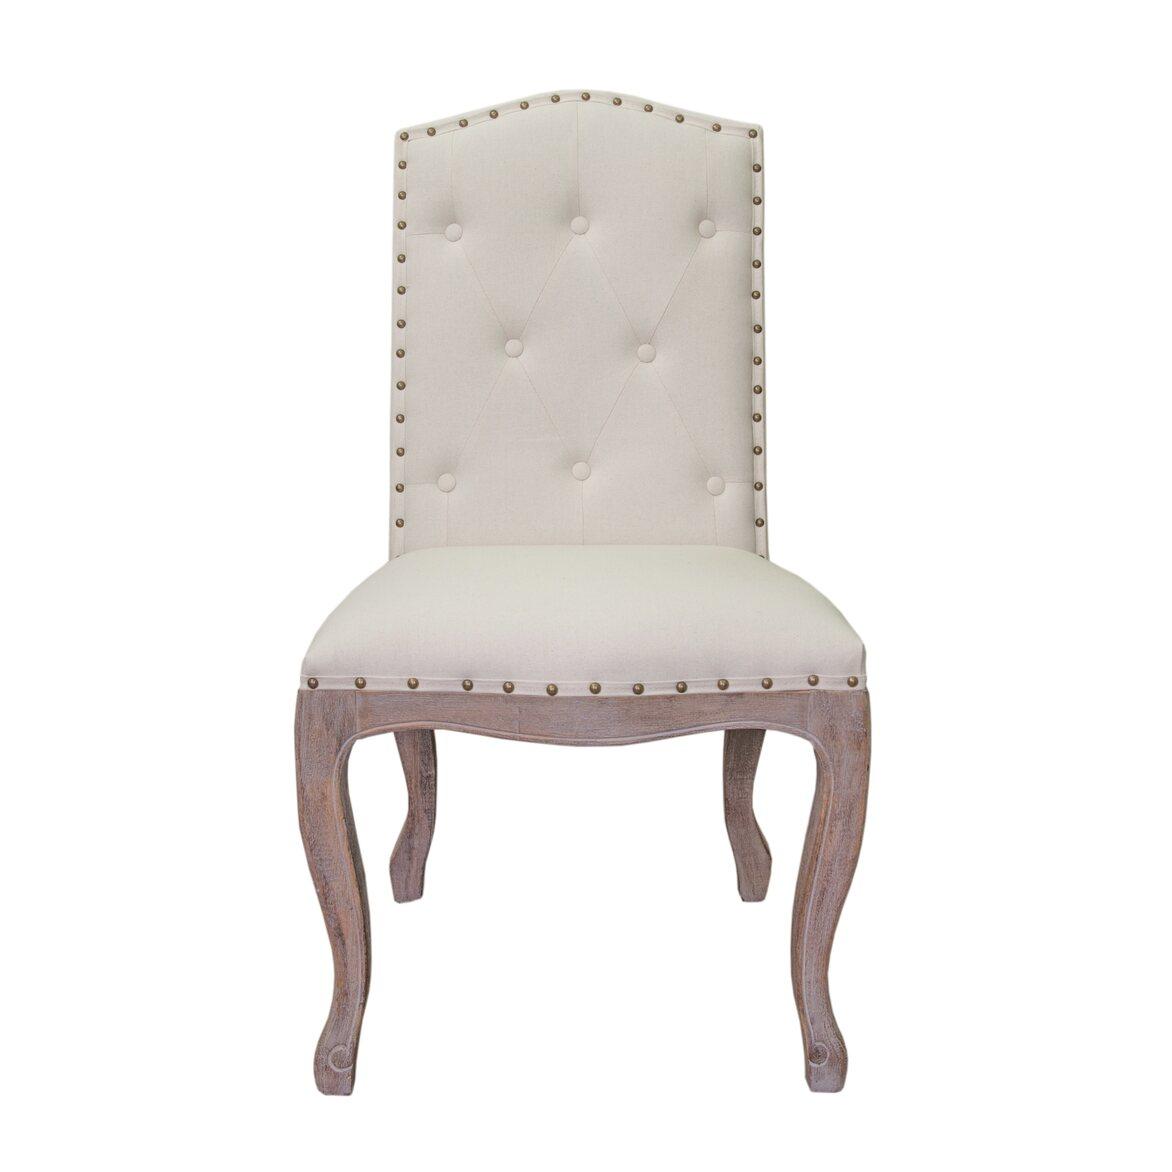 Стул Melis beige | Обеденные стулья Kingsby